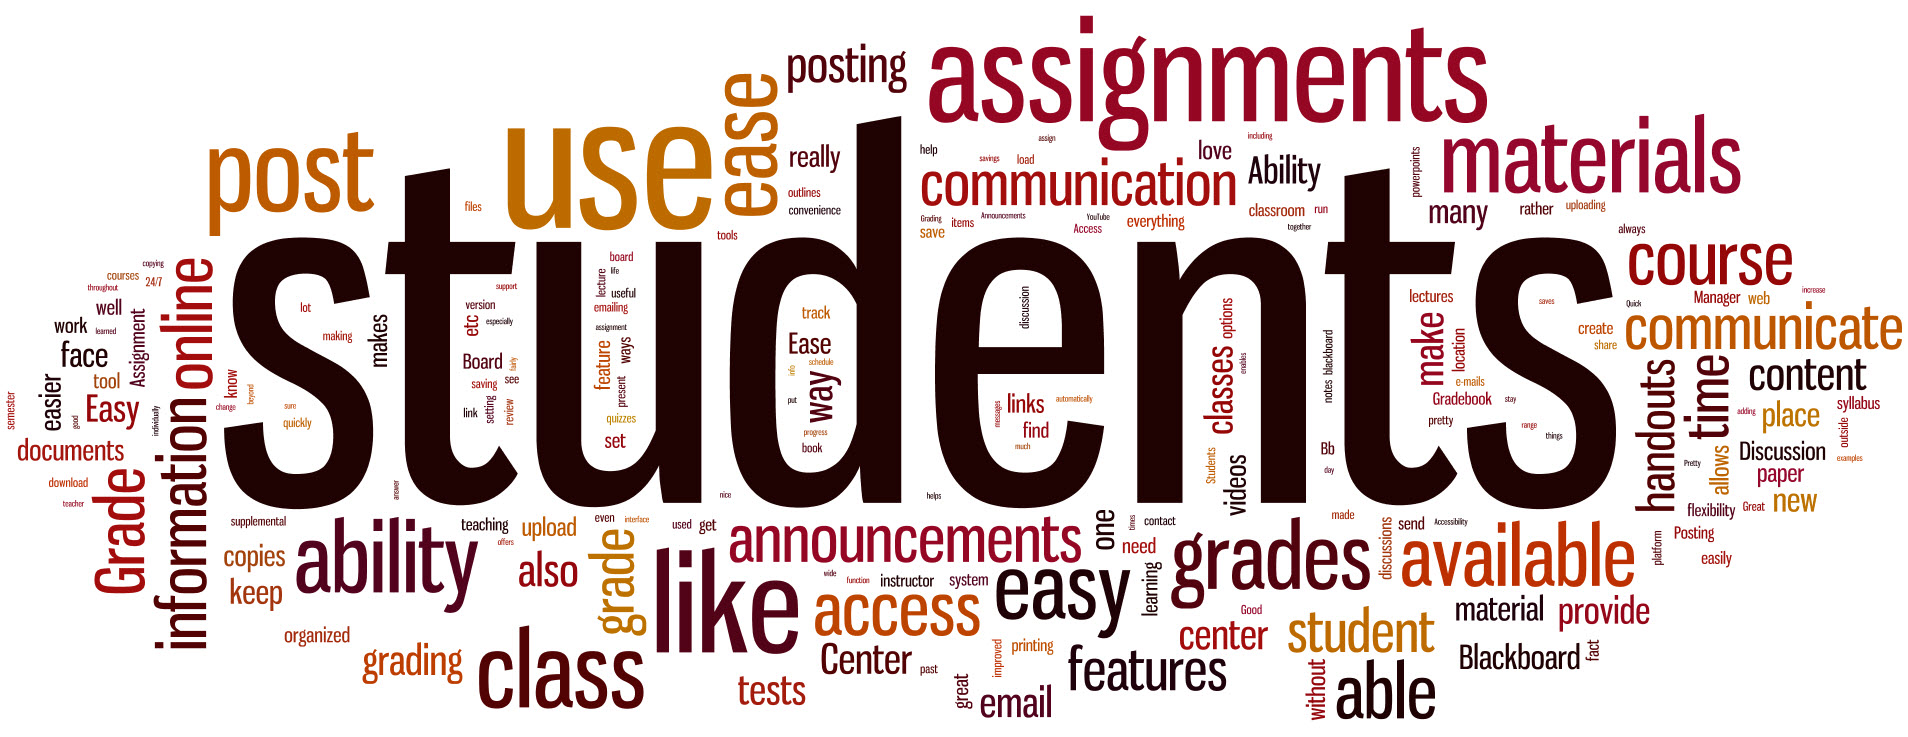 faculty word representation